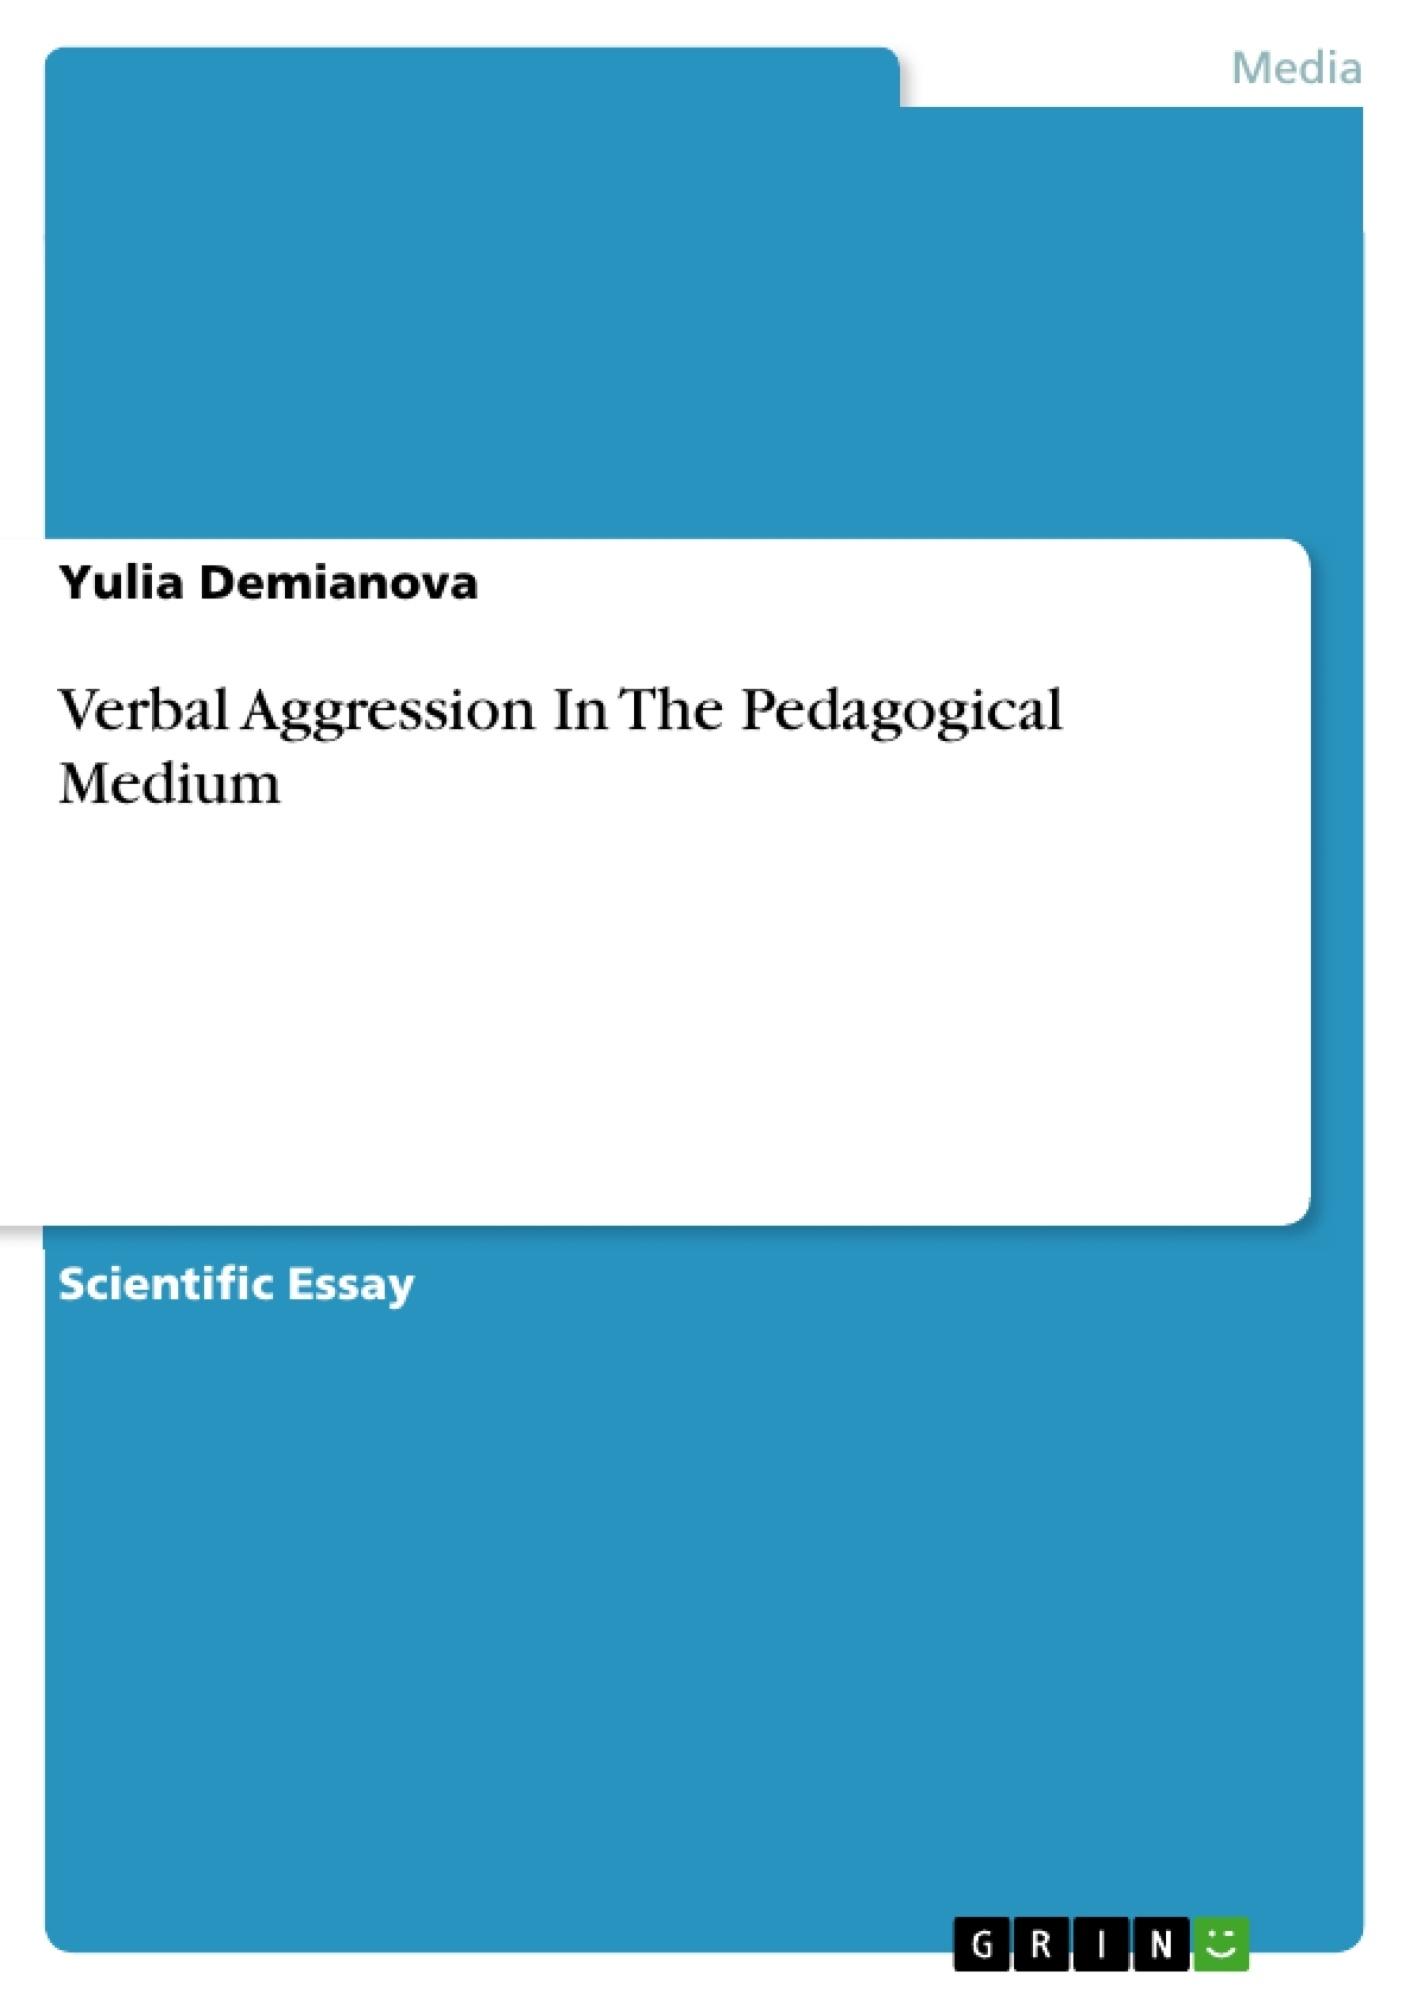 Title: Verbal Aggression In The Pedagogical Medium